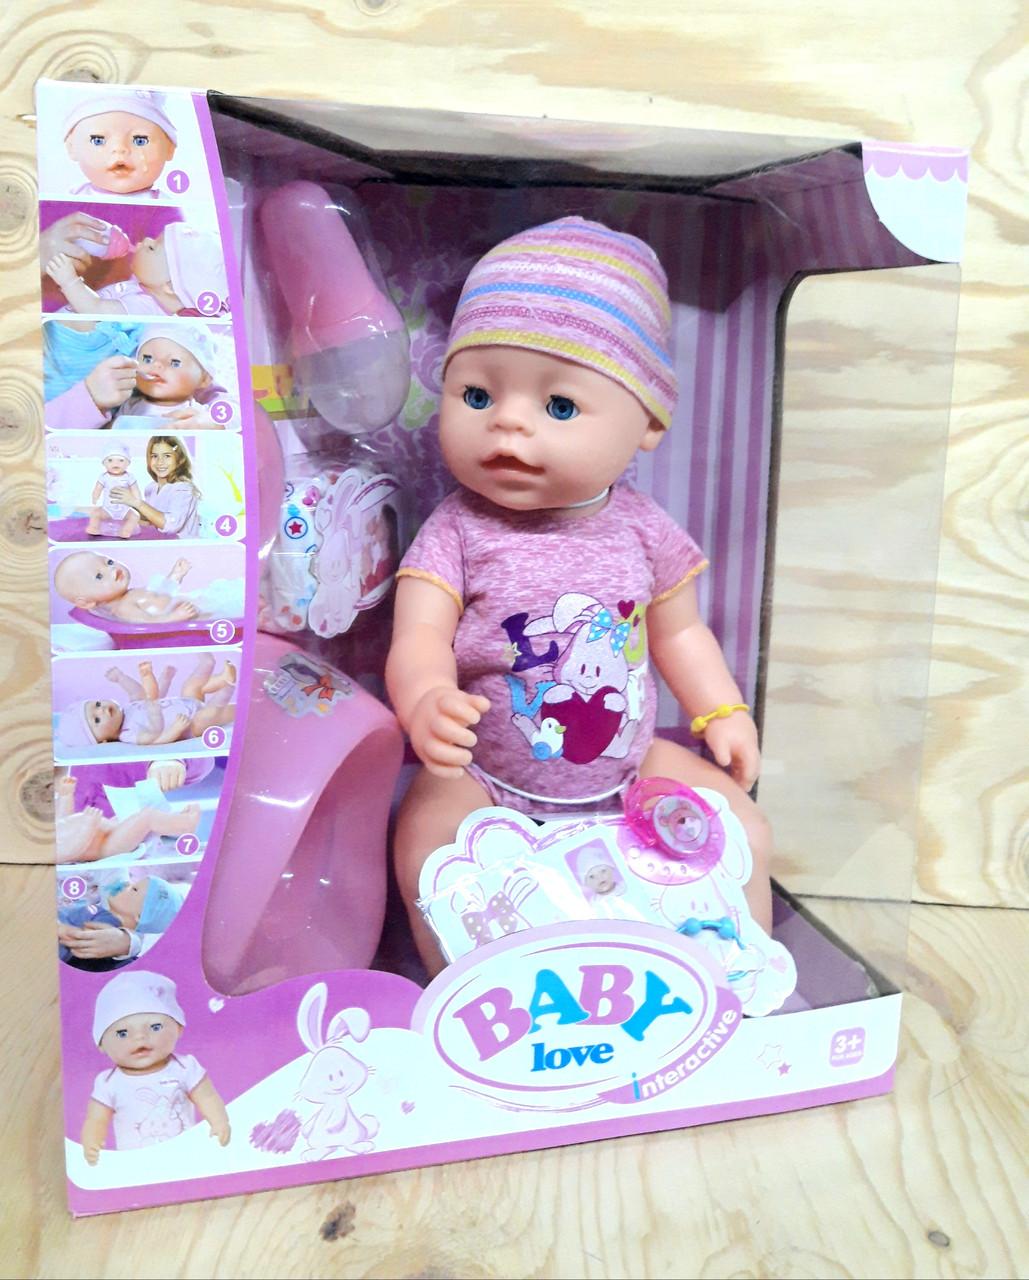 Bl012BCD Baby love